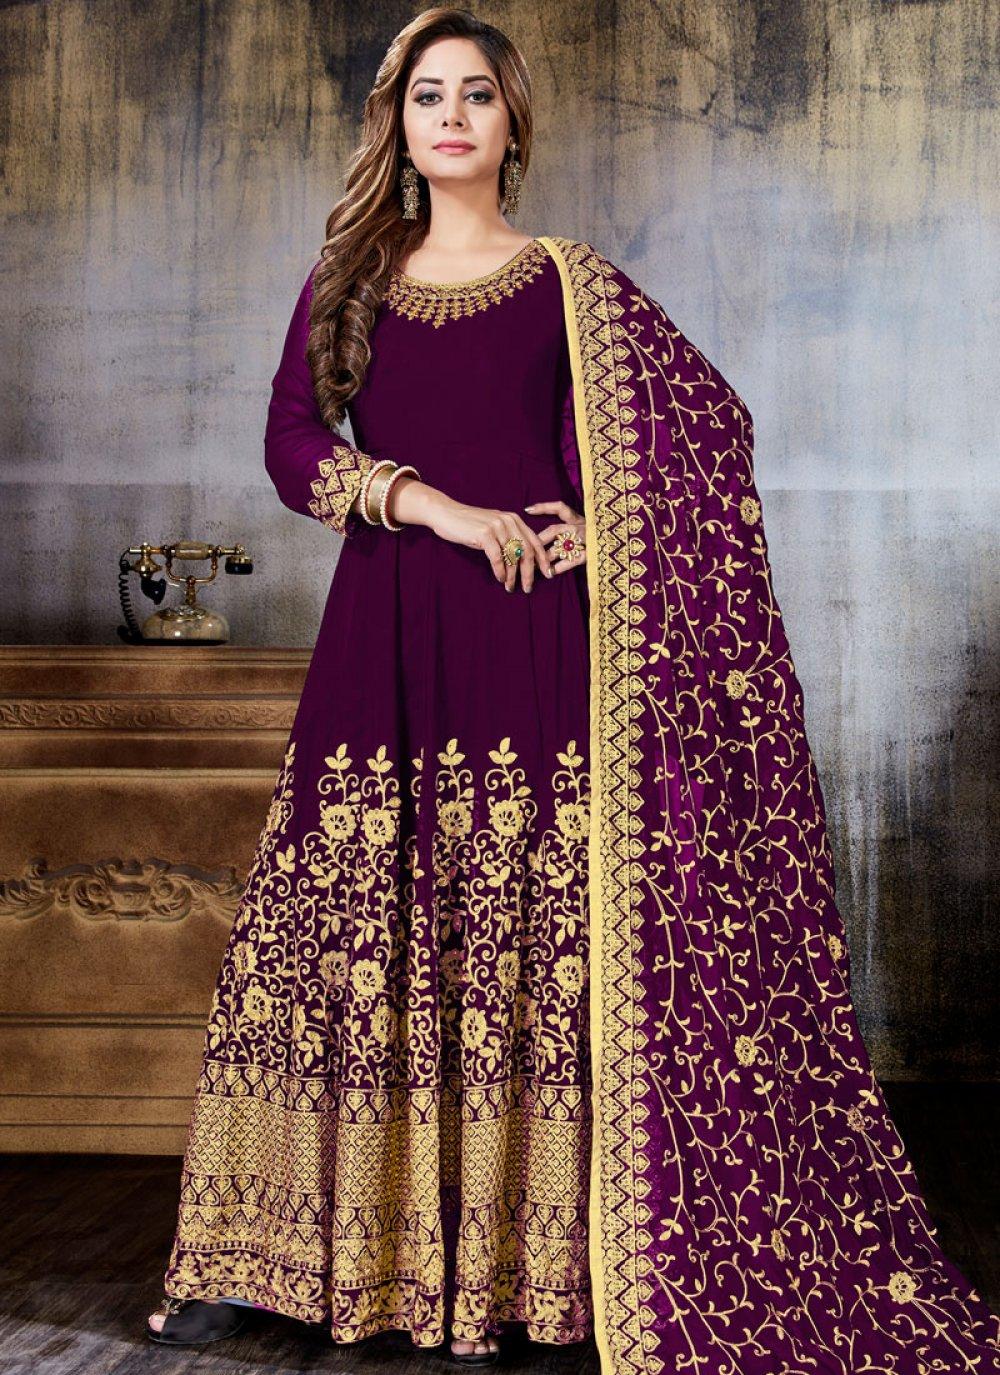 Embroidered Faux Georgette Anarkali Salwar Suit in Magenta